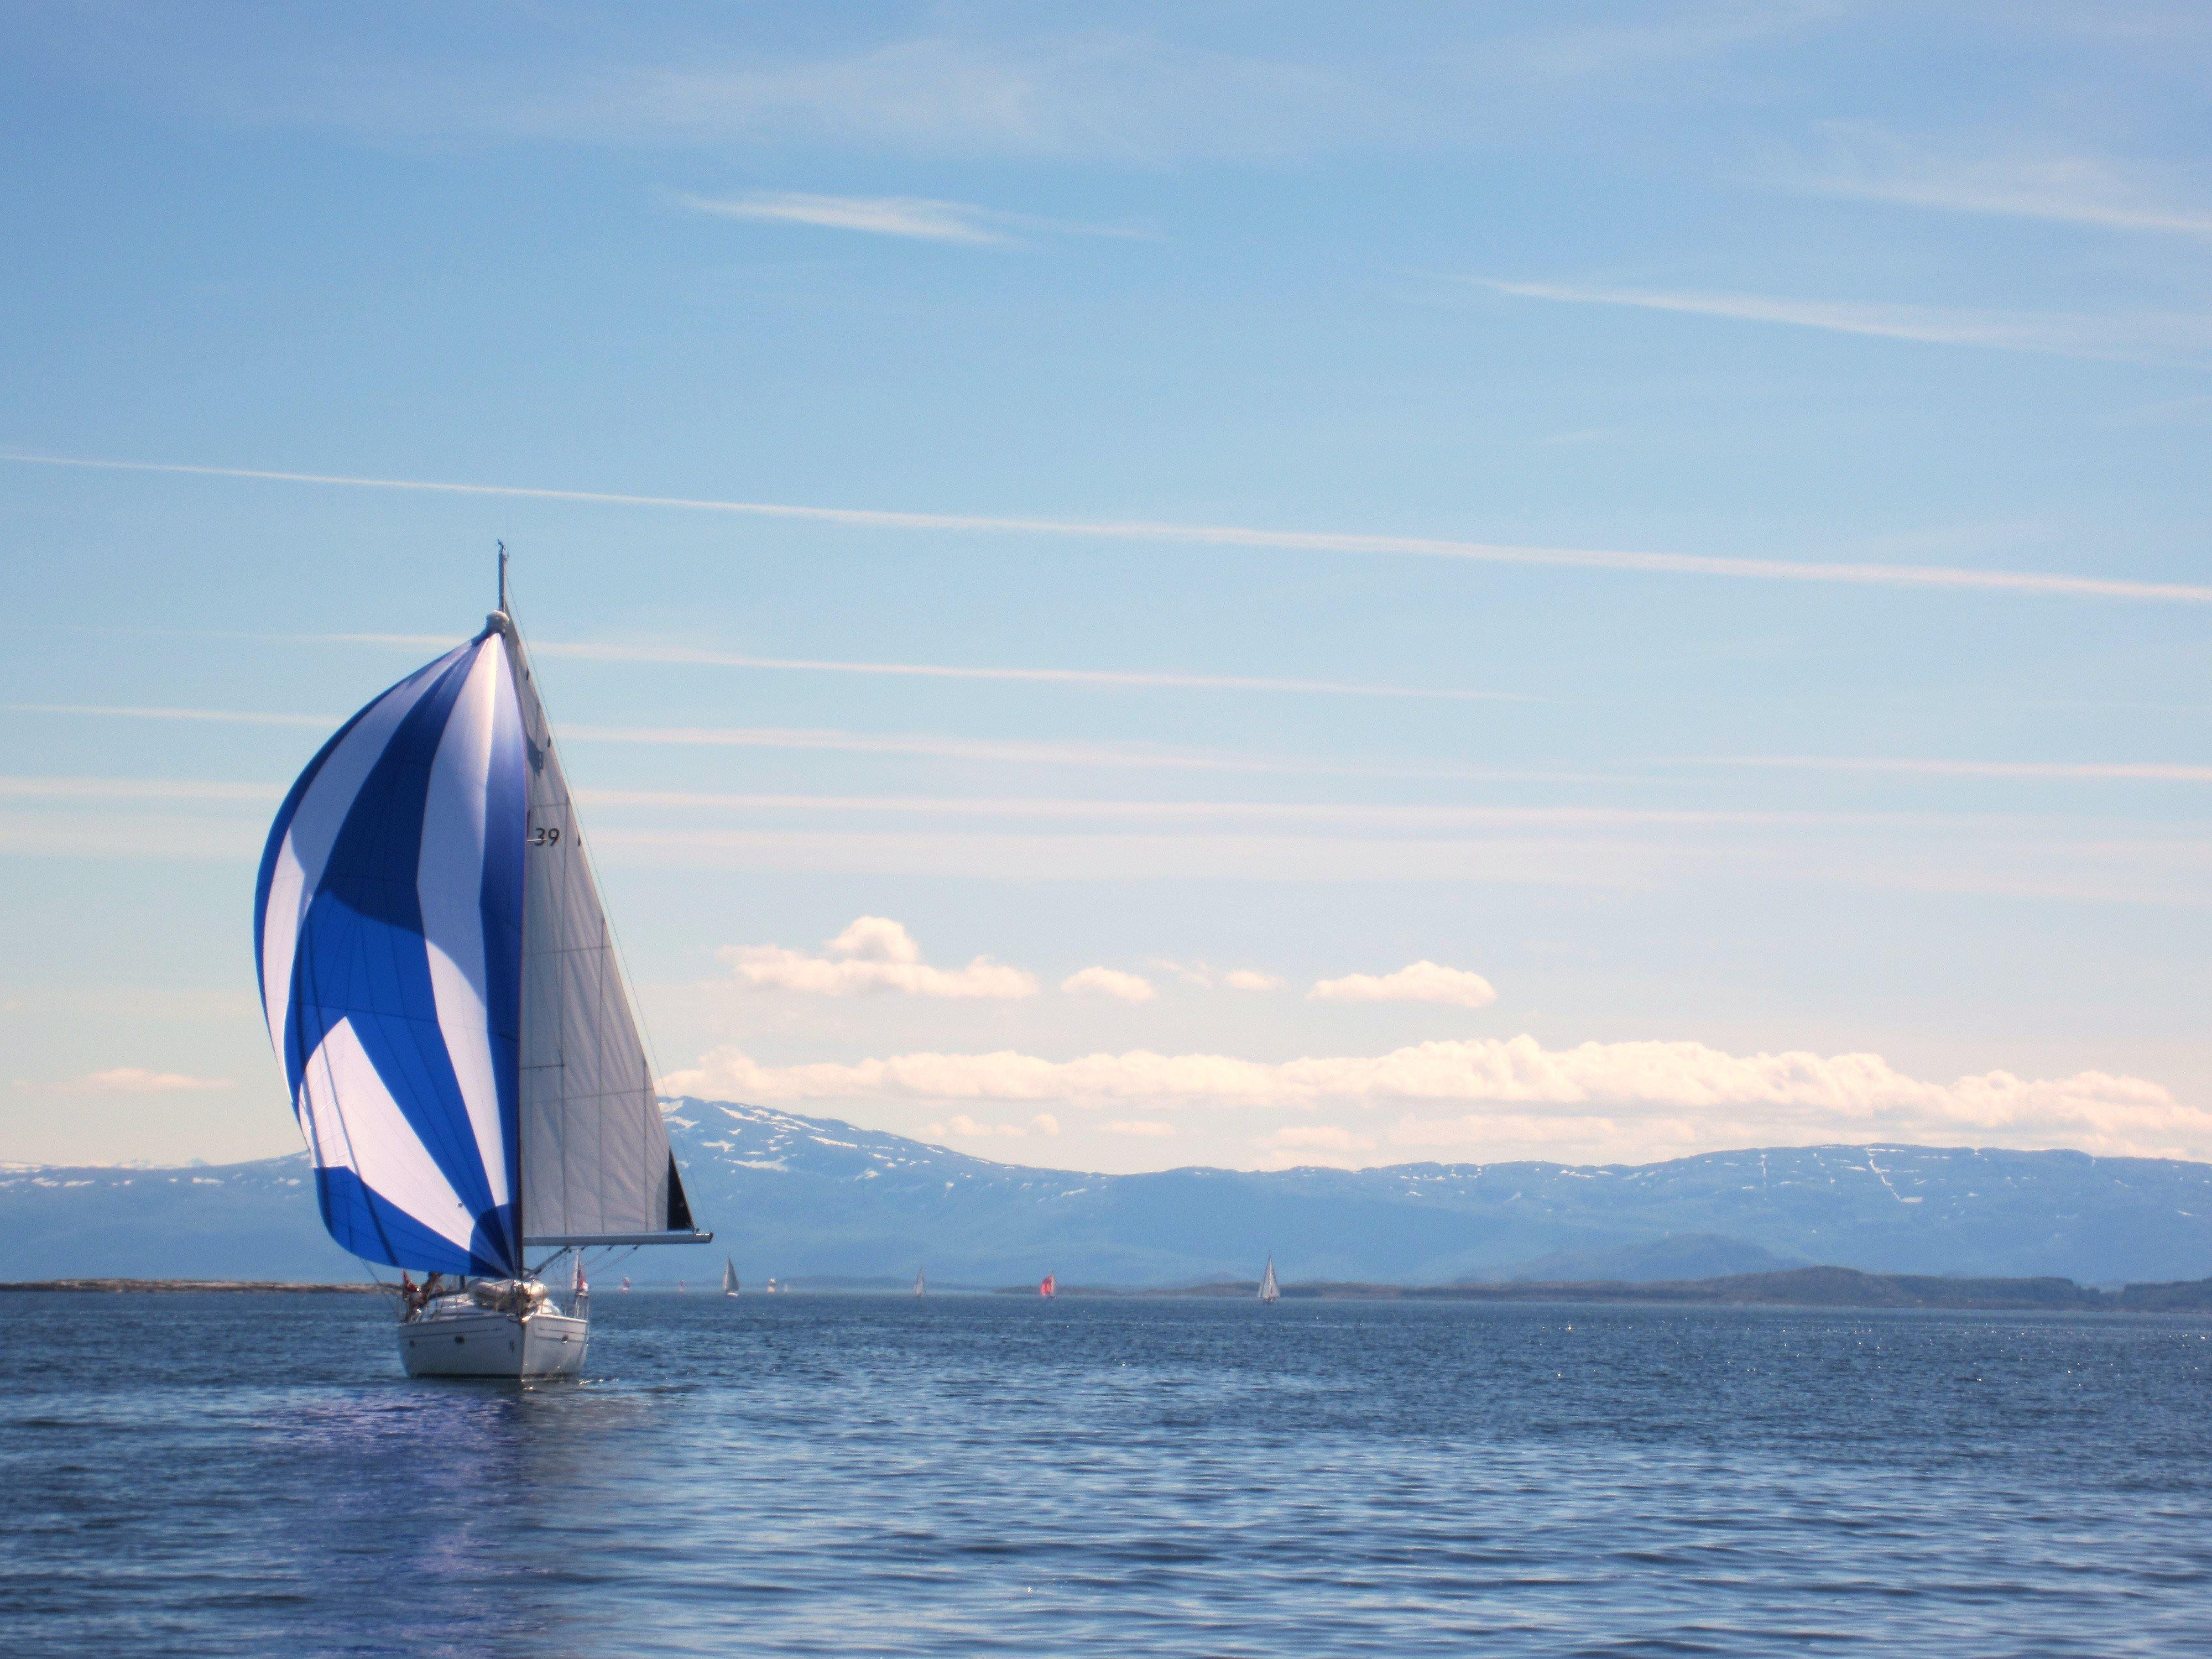 Sailing excursion with Arctic Circle Sail Charter